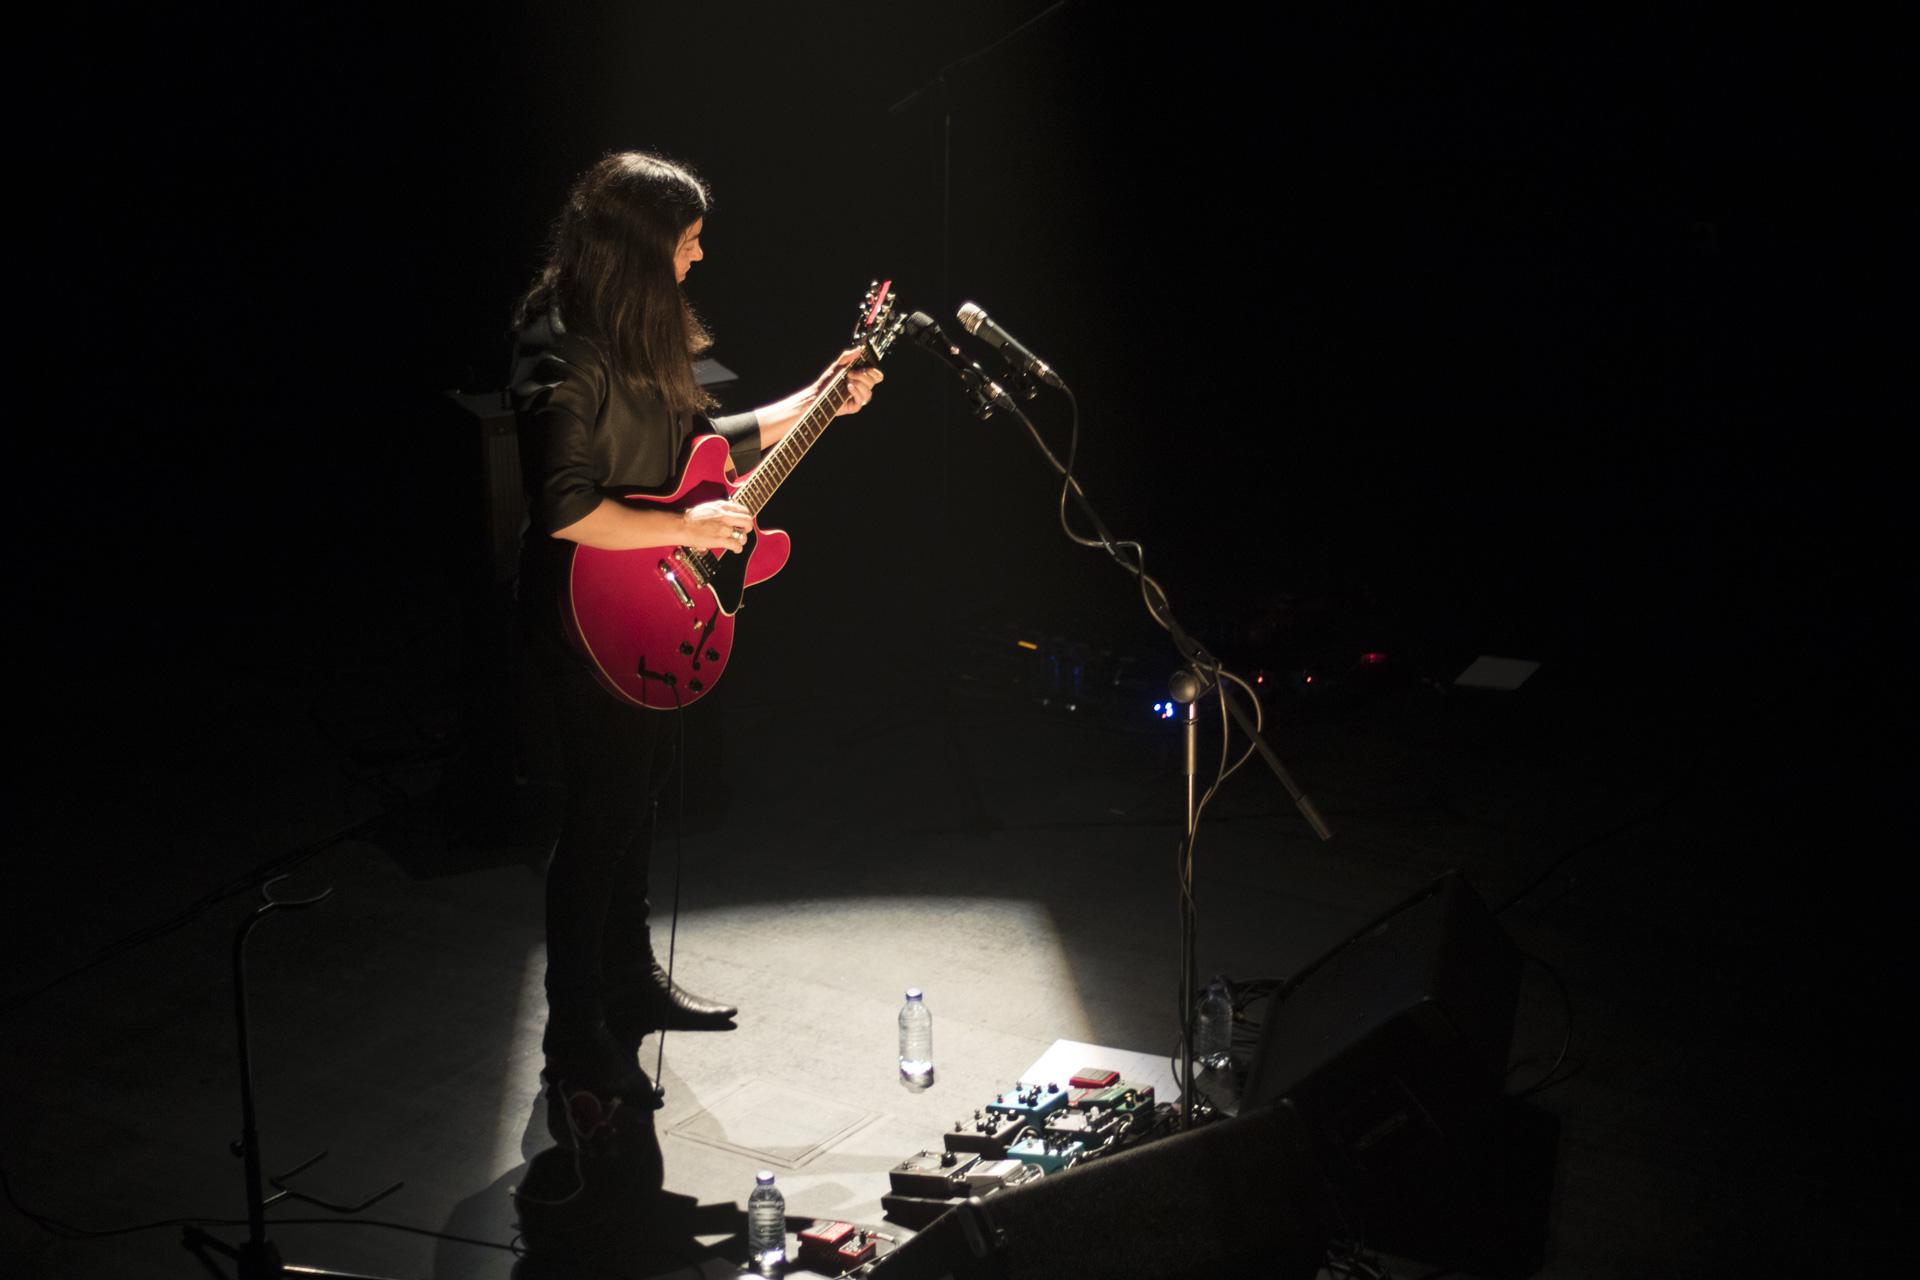 Nadine Khouri